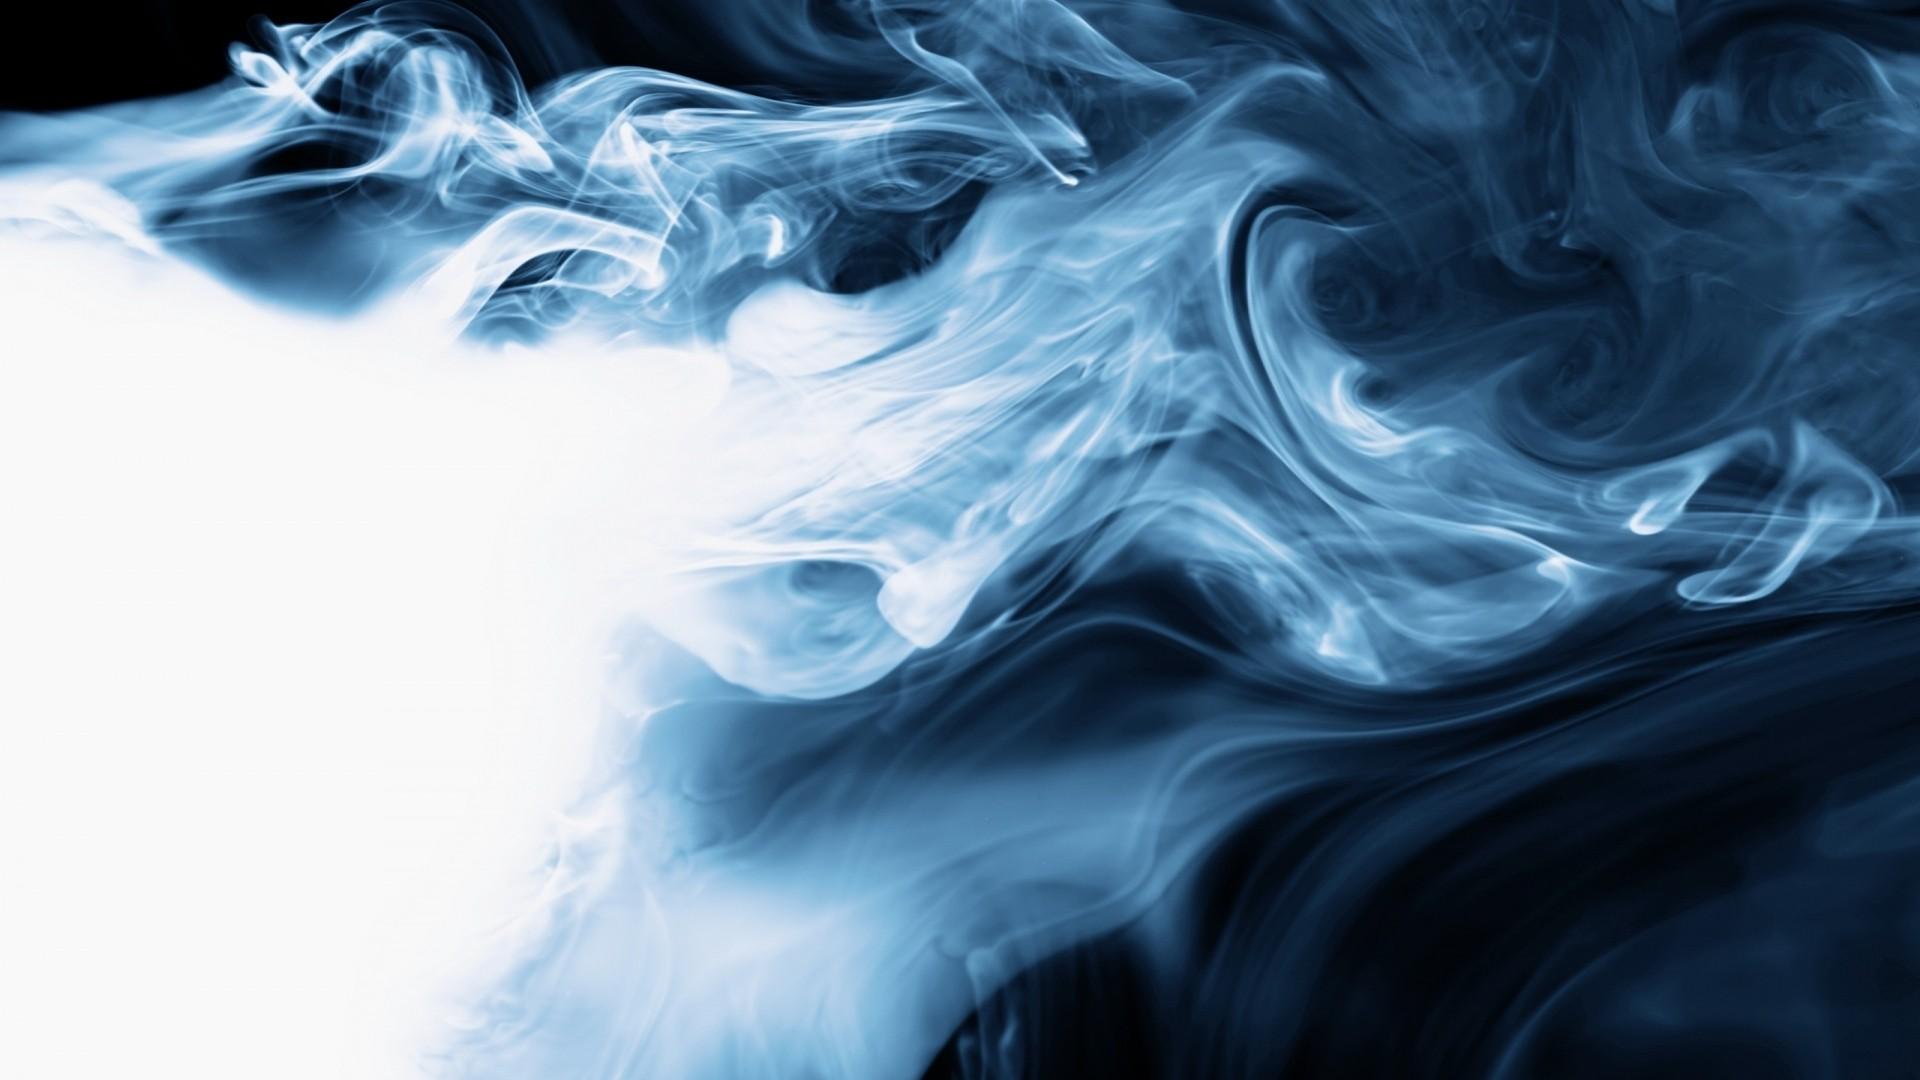 Smoke Free Wallpaper and Background